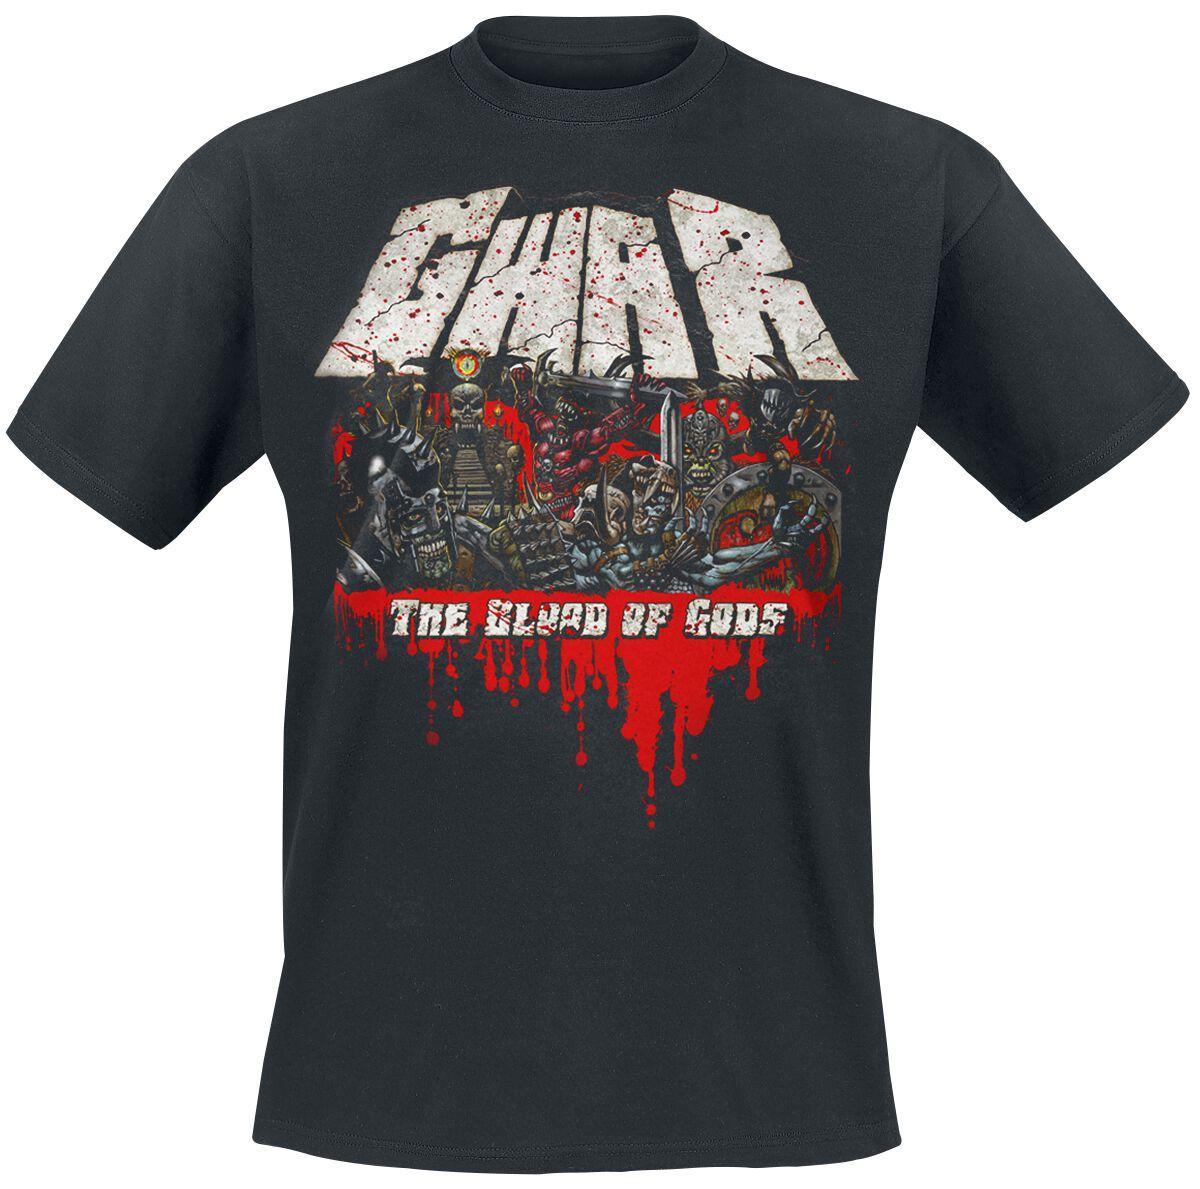 Zespoły - Koszulki - T-Shirt GWAR The blood of gods T-Shirt czarny - 368102